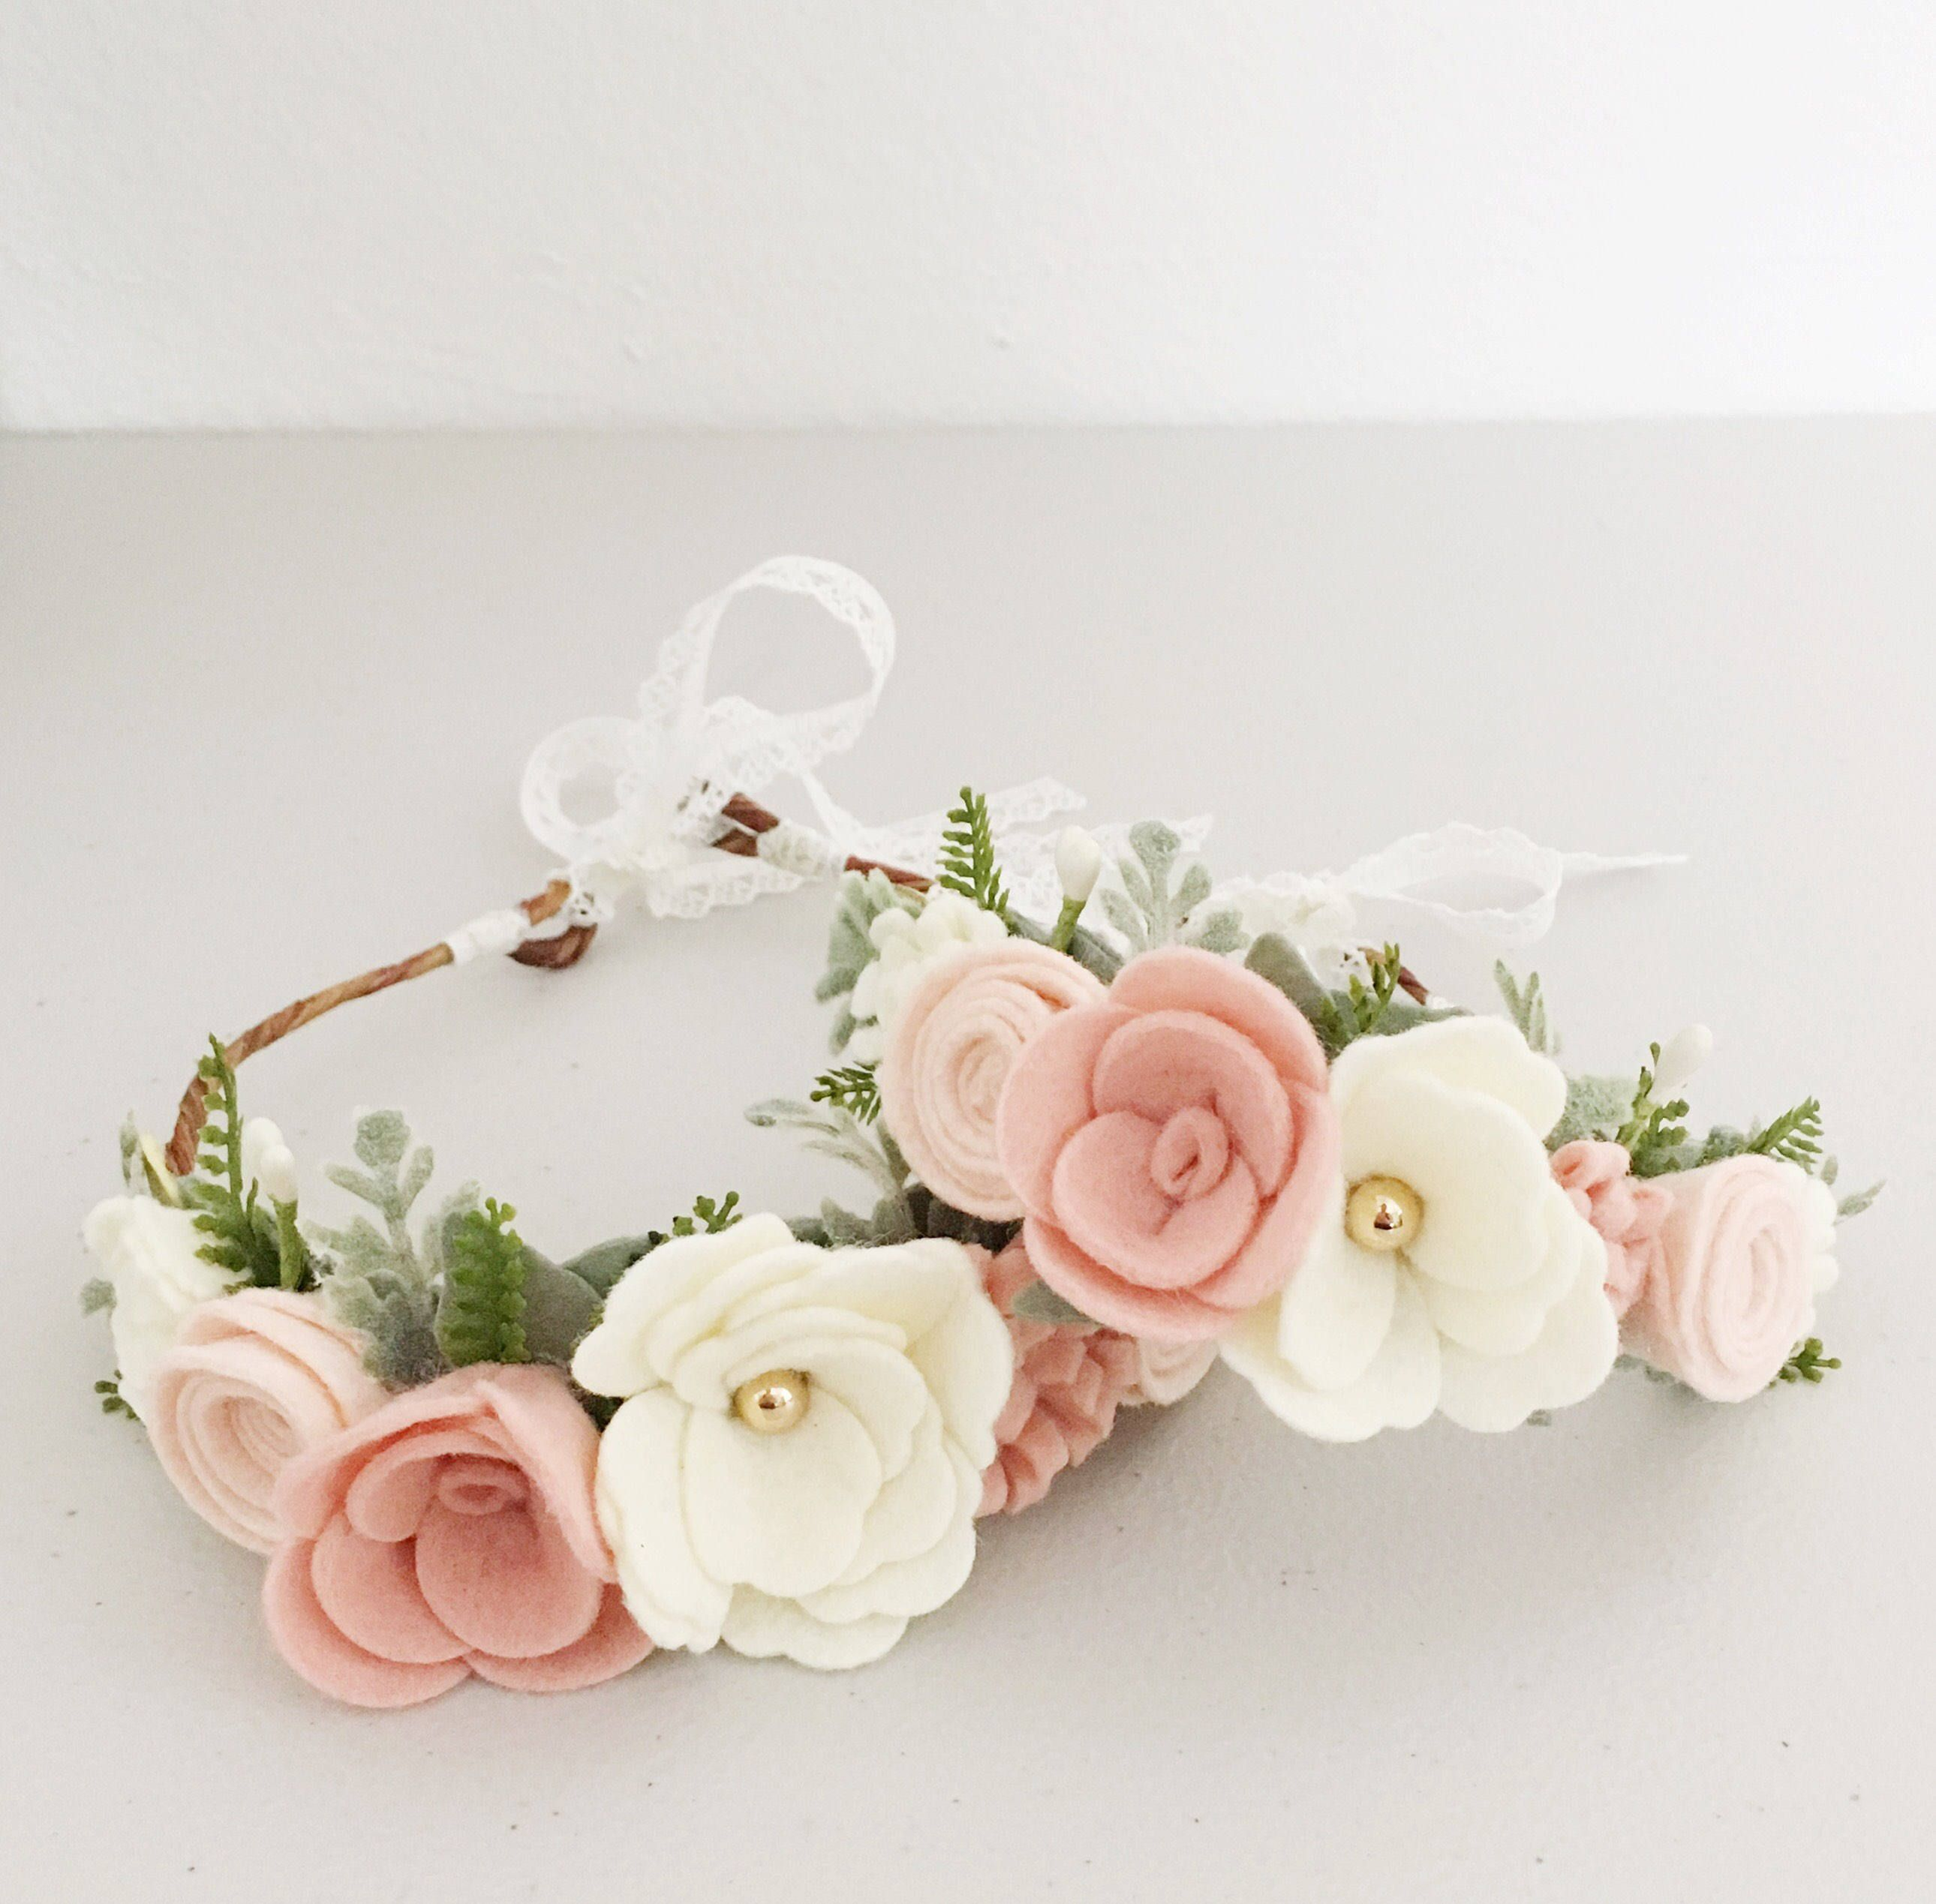 newborn headband Baby flower headband Skinny Nylon Headband baby flower crown,blush pink tieback flower crown baby photo prop